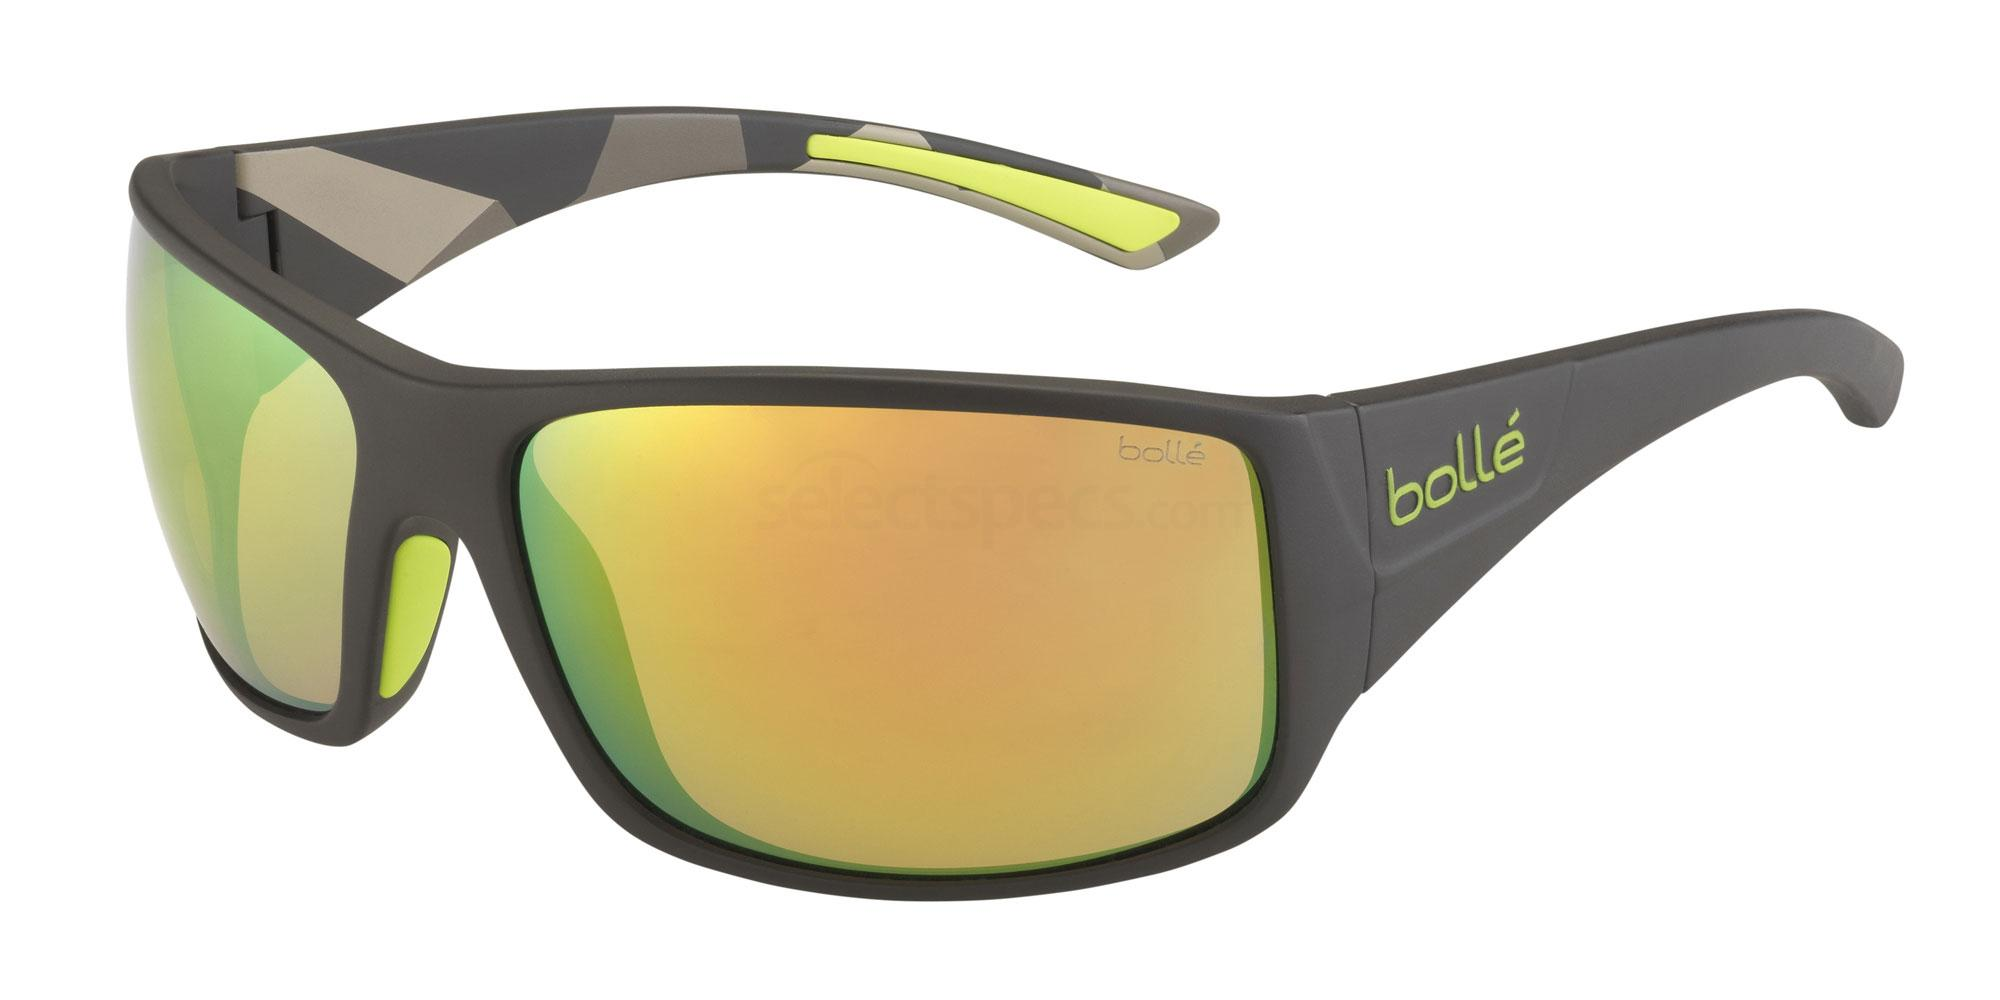 christmas gift guide for sporty men bolle sunglasses budget